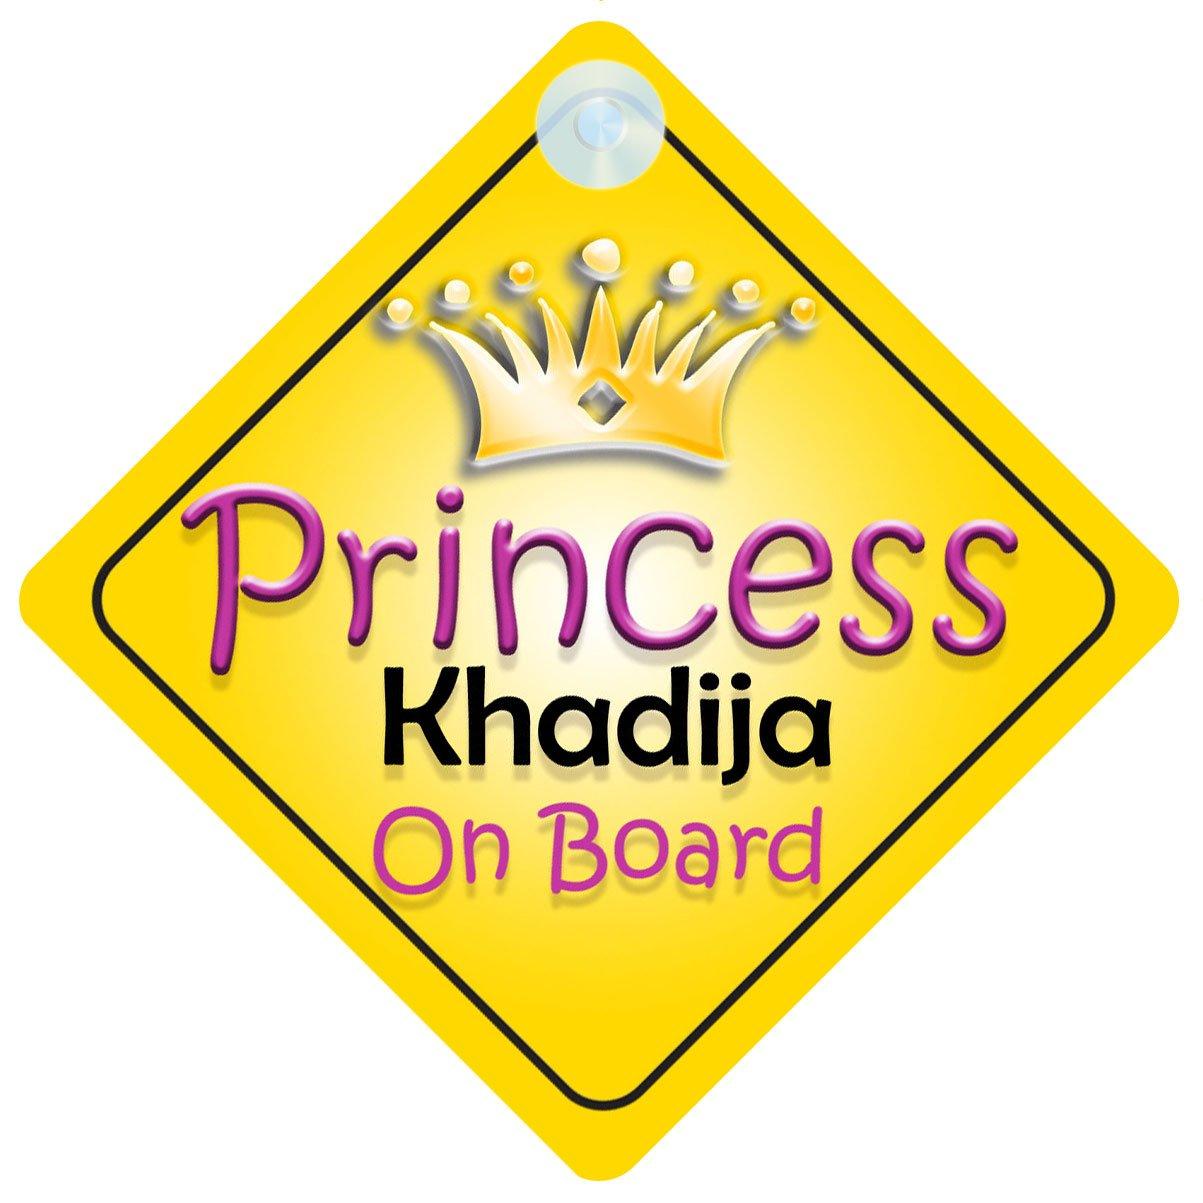 Princess Khadija On Board Girl Car Sign Child/Baby Gift/Present 002 Quality Goods Ltd